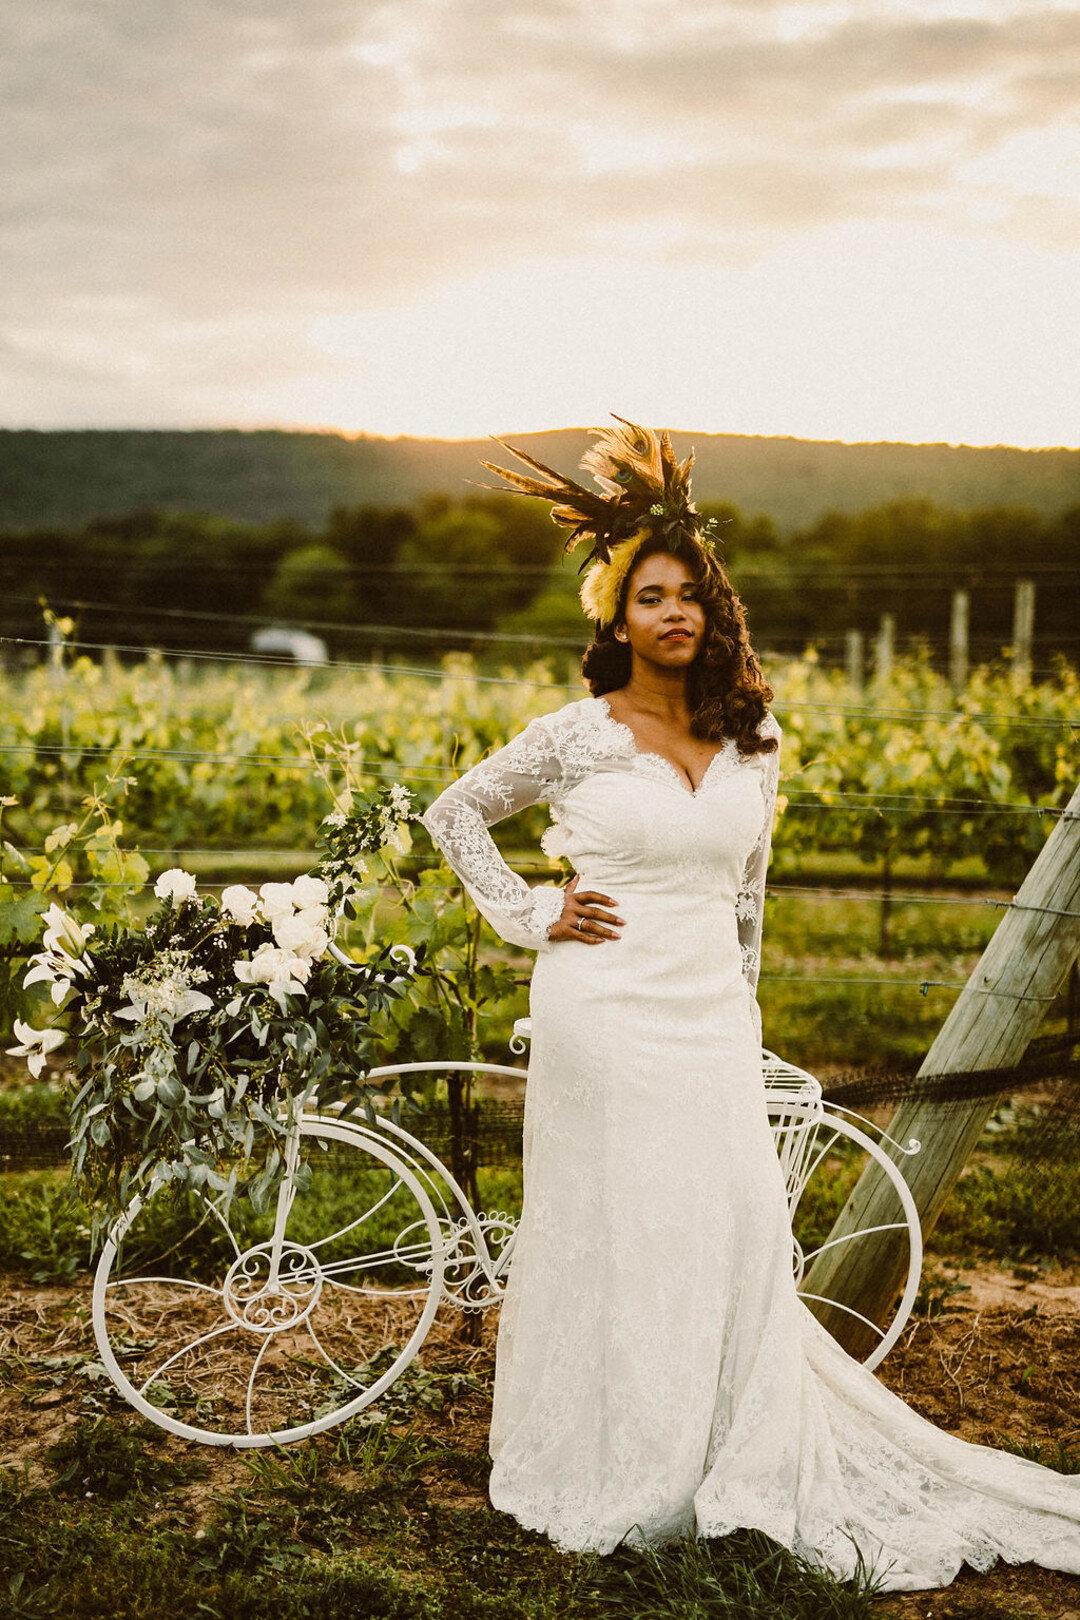 black bride with vintage bike